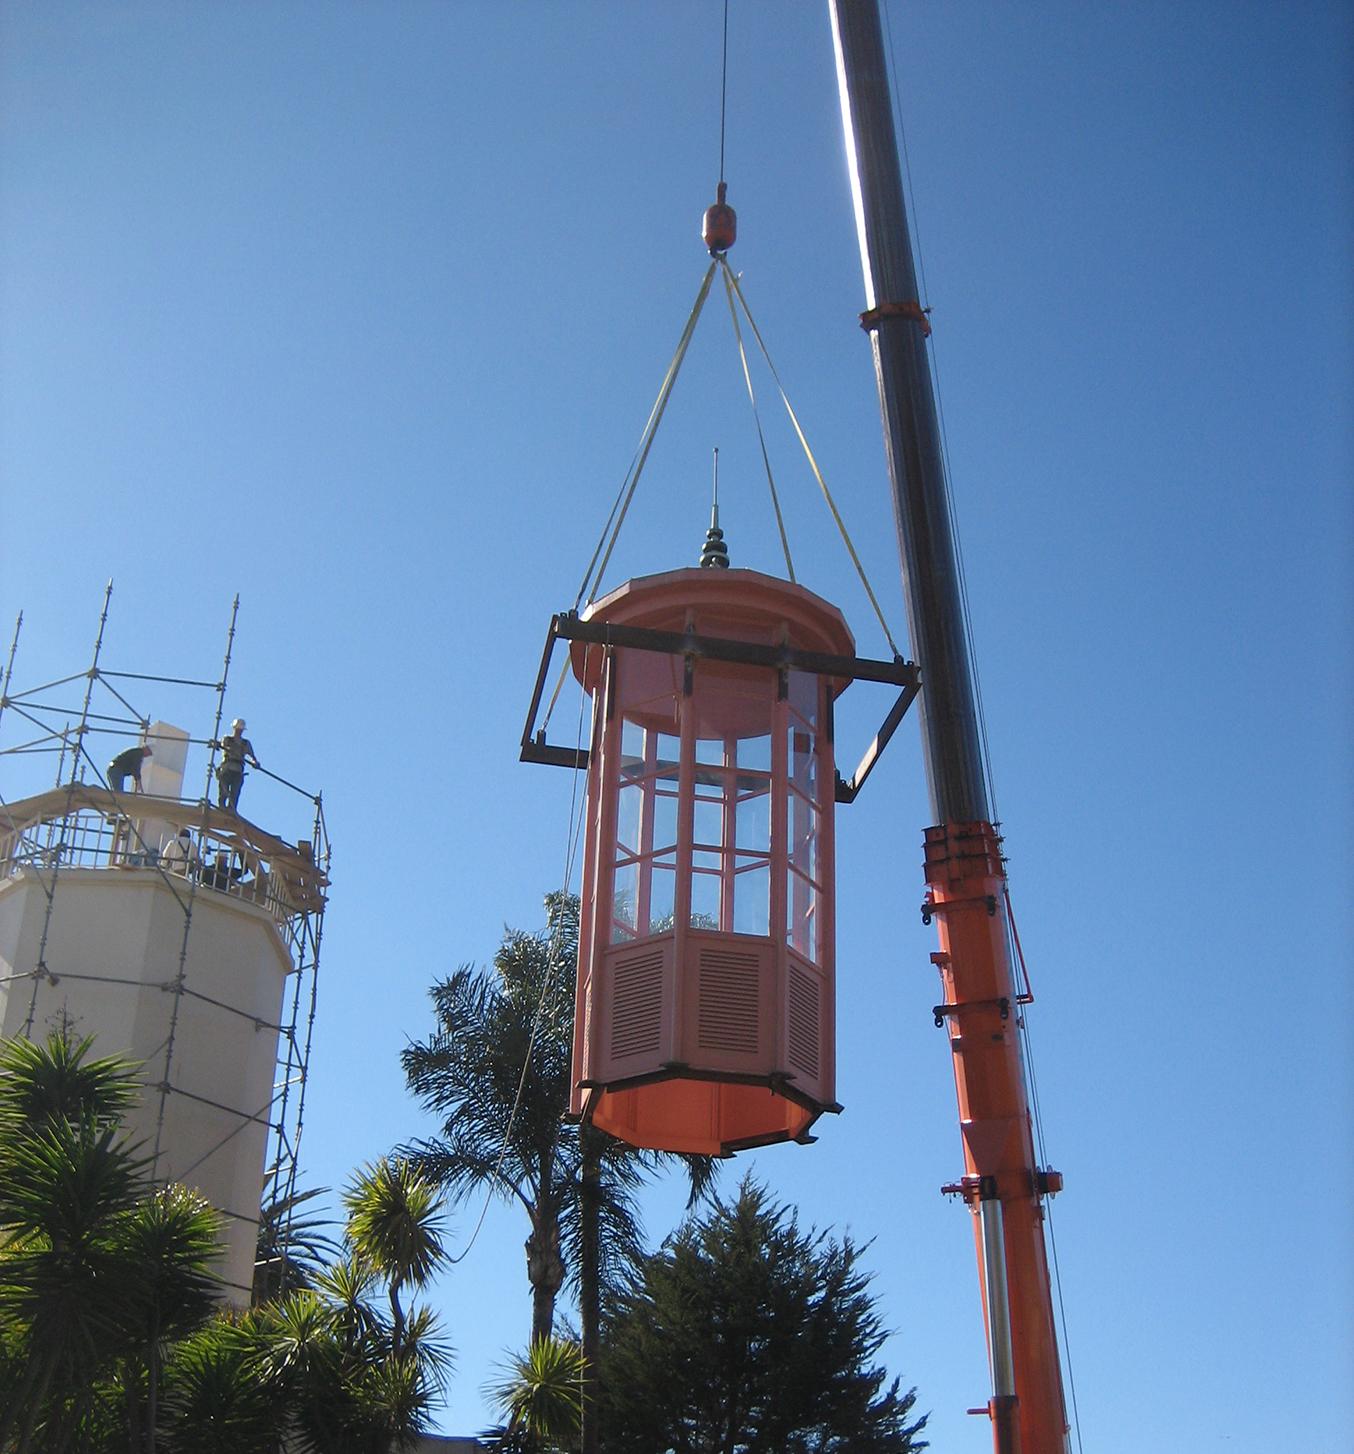 Coral Casino Beach Cabana Club Historic Beacon Crane Lift